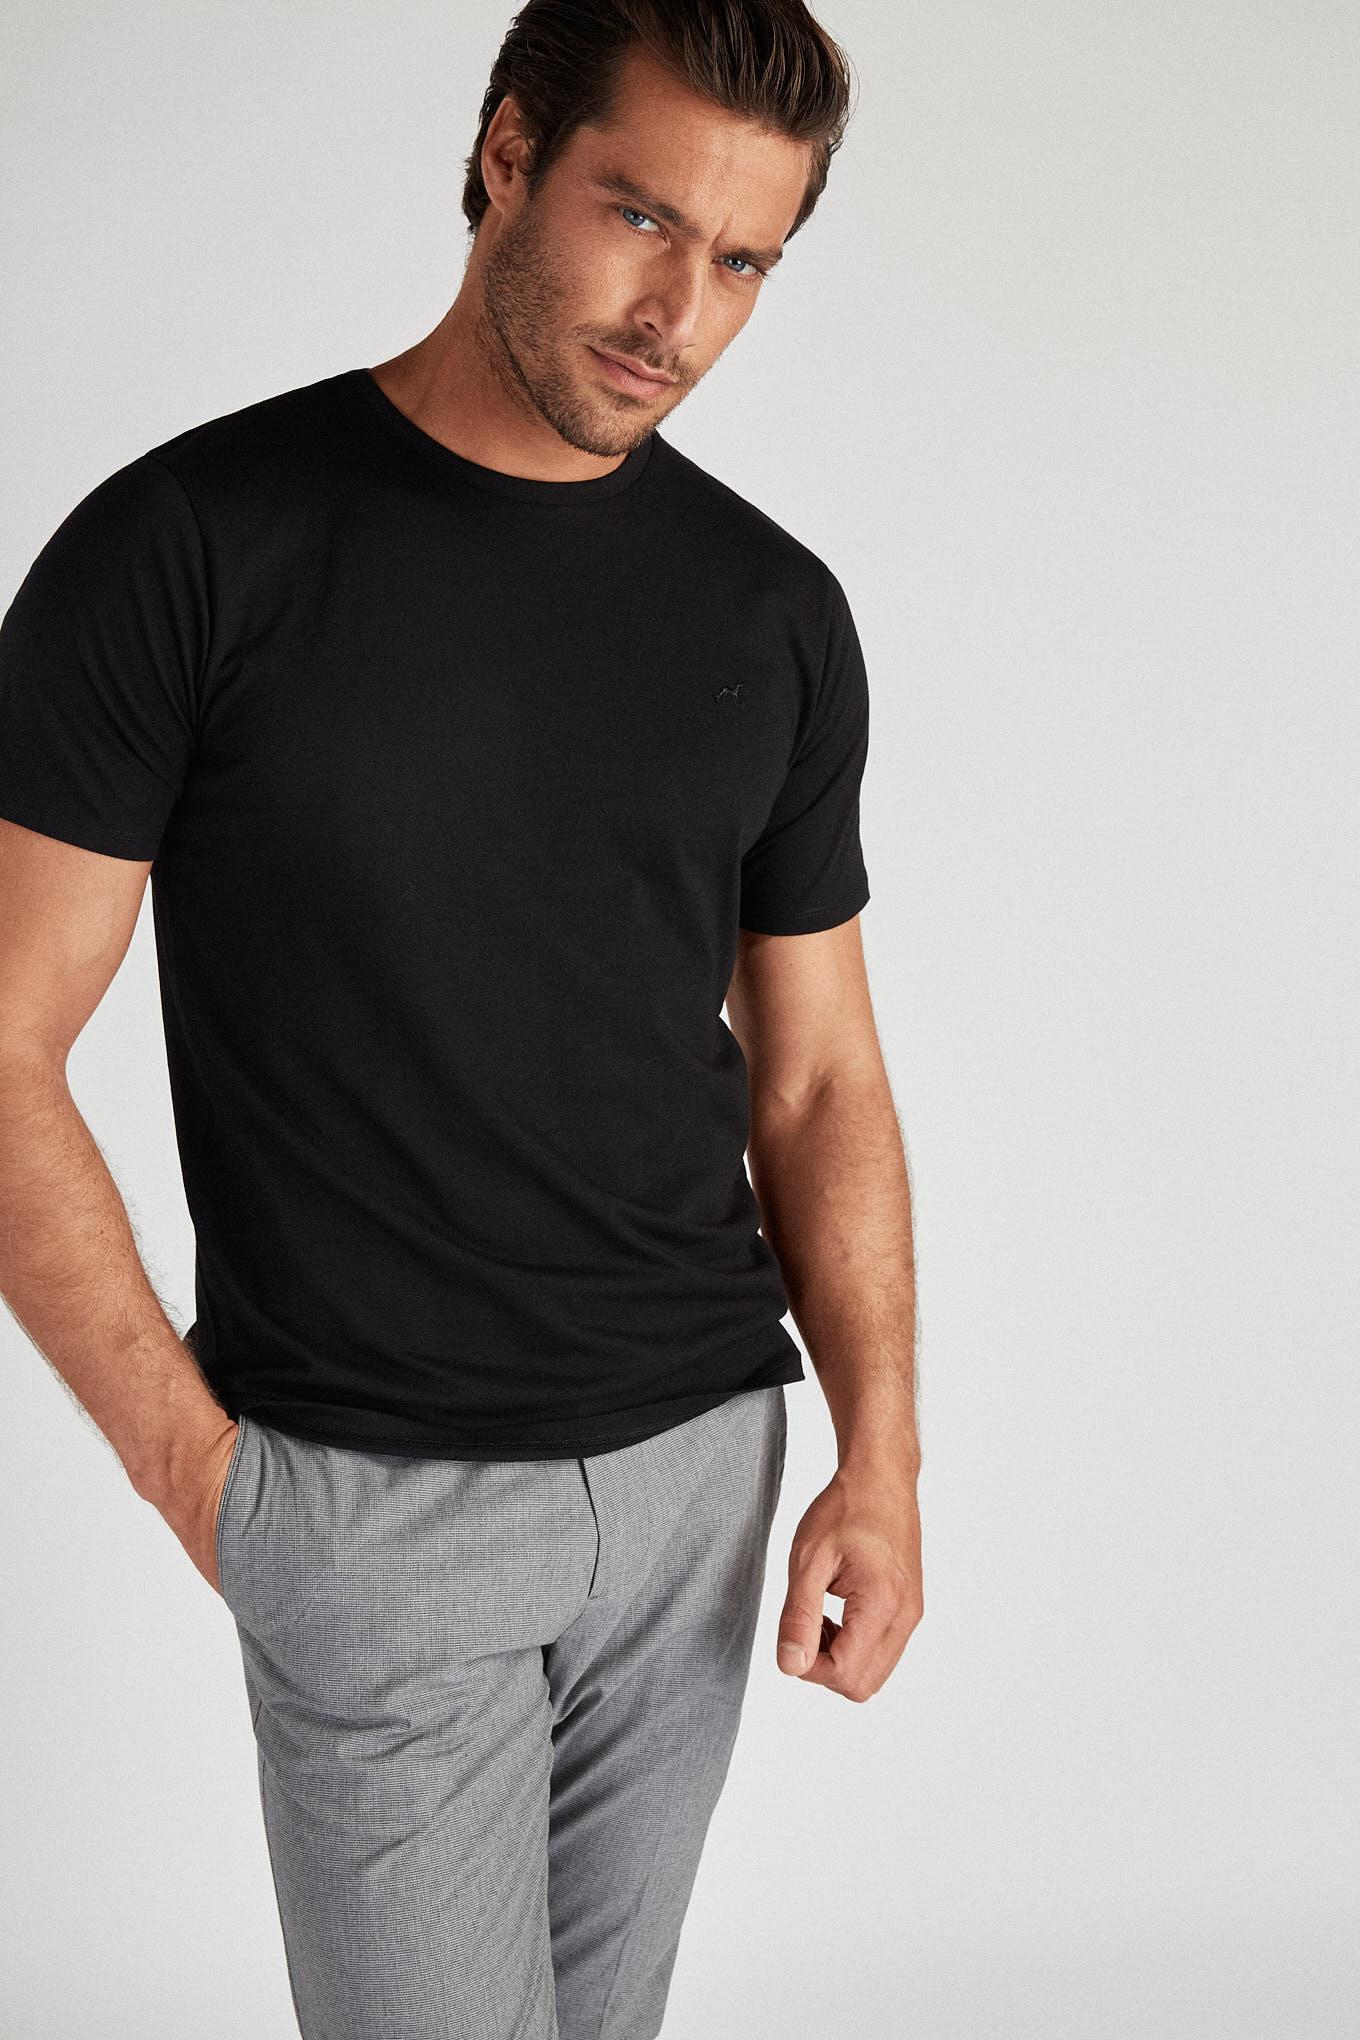 T-Shirt Black Sport Man